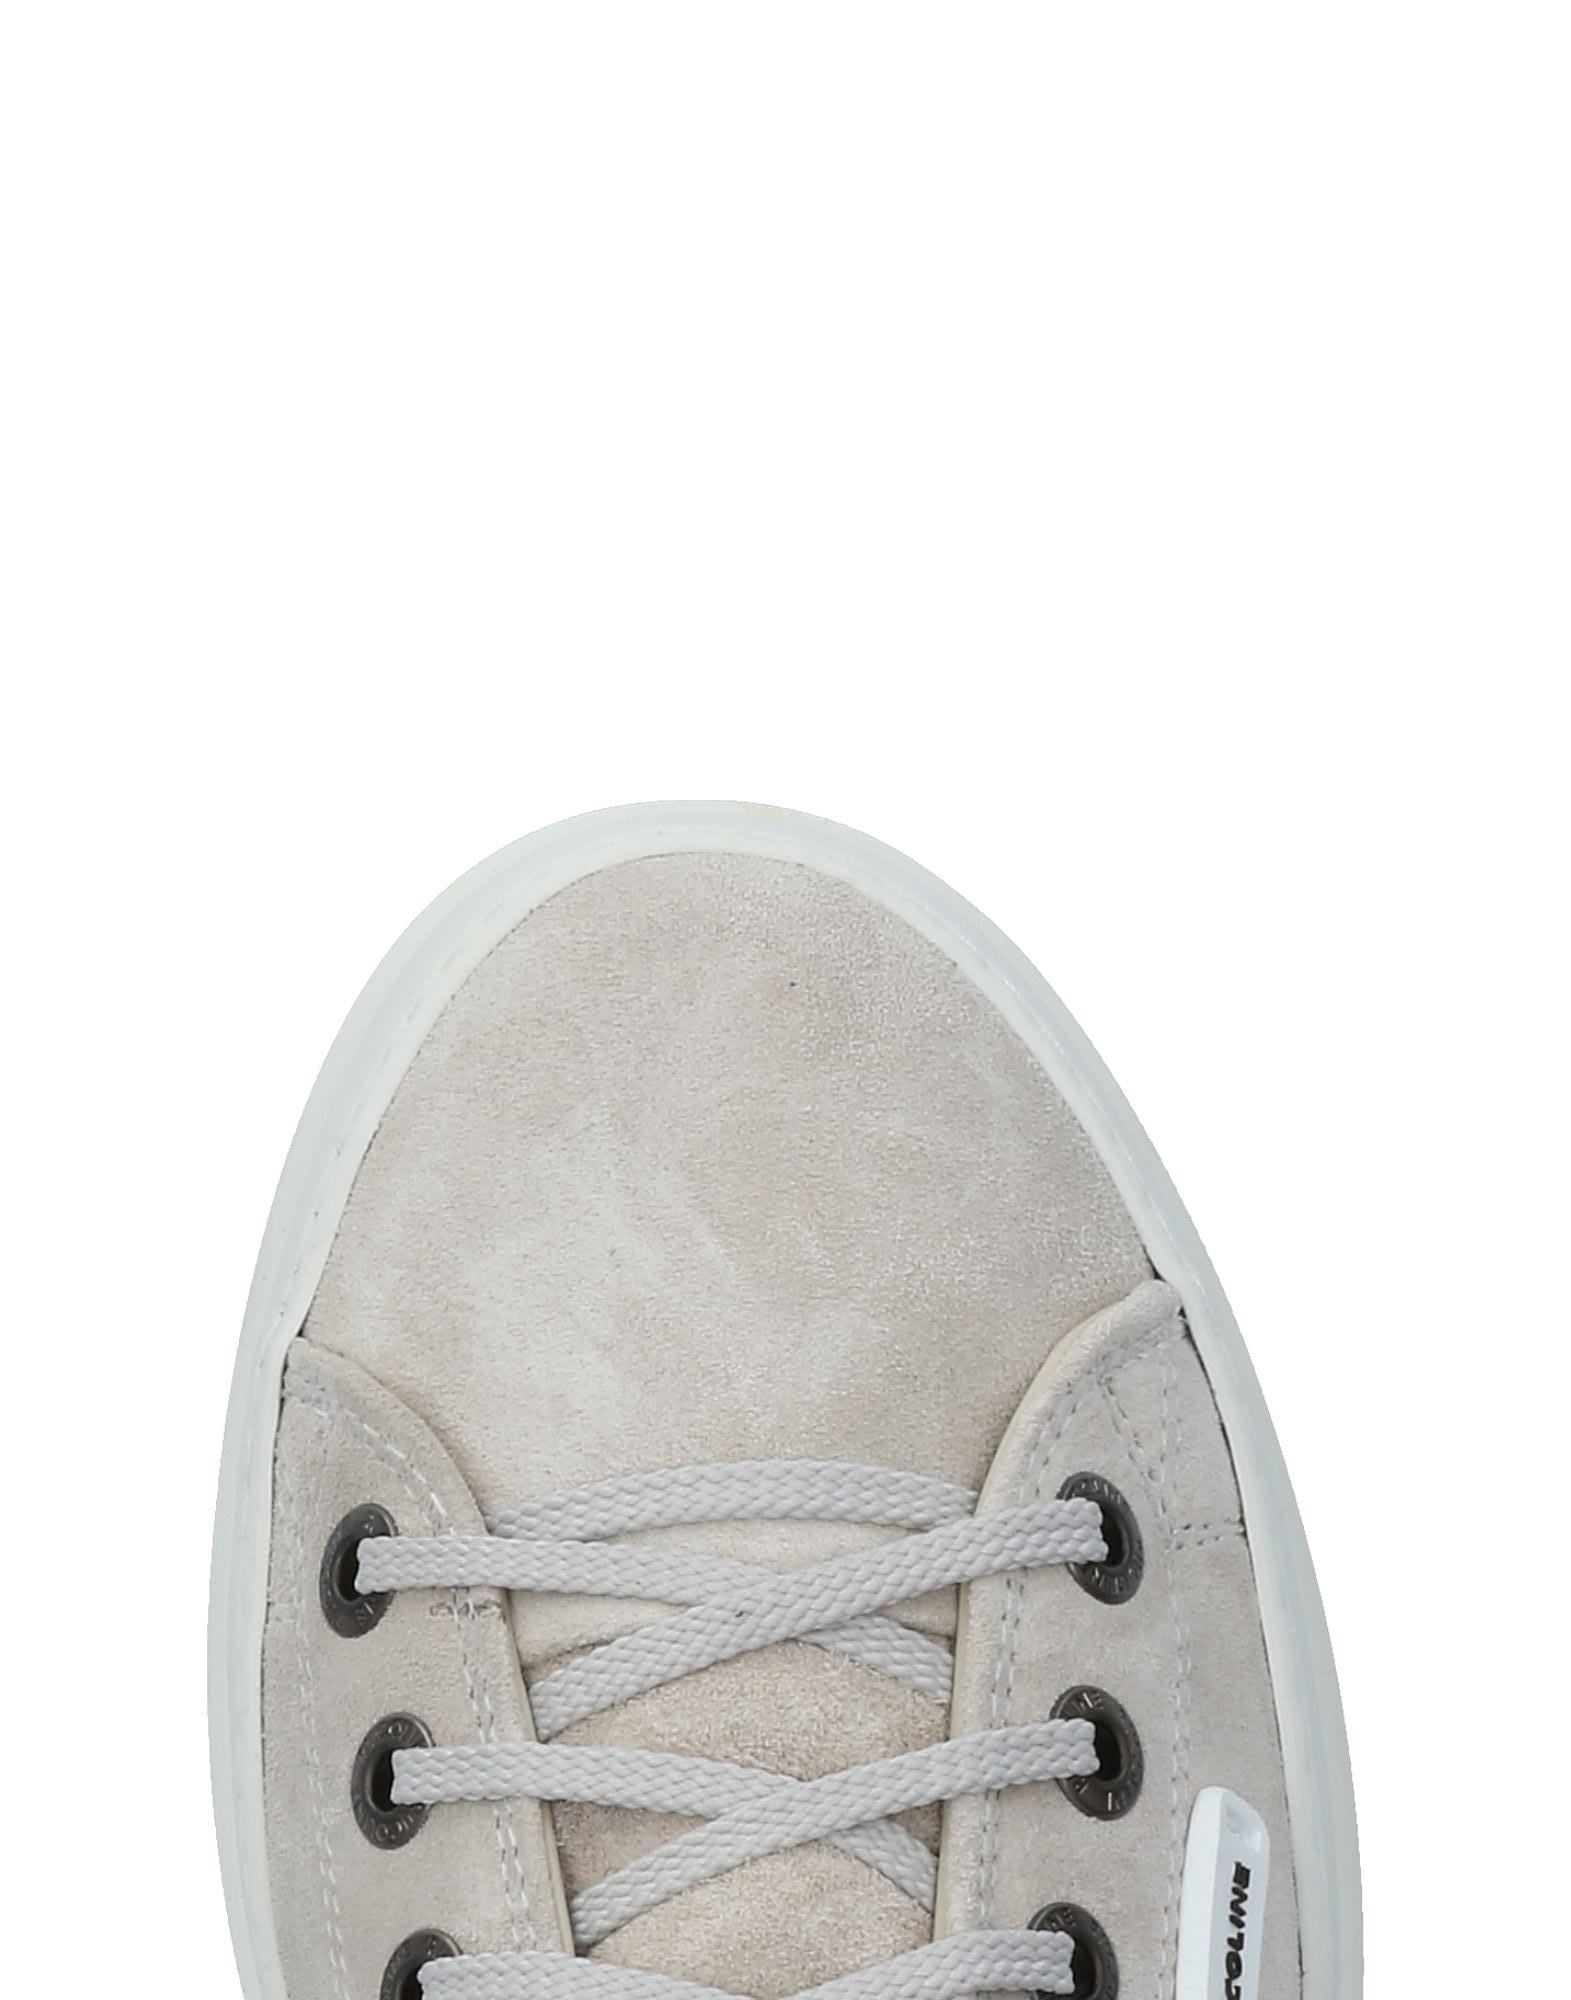 Ruco Line Sneakers Damen Schuhe  11477219ML Gute Qualität beliebte Schuhe Damen cbabf8